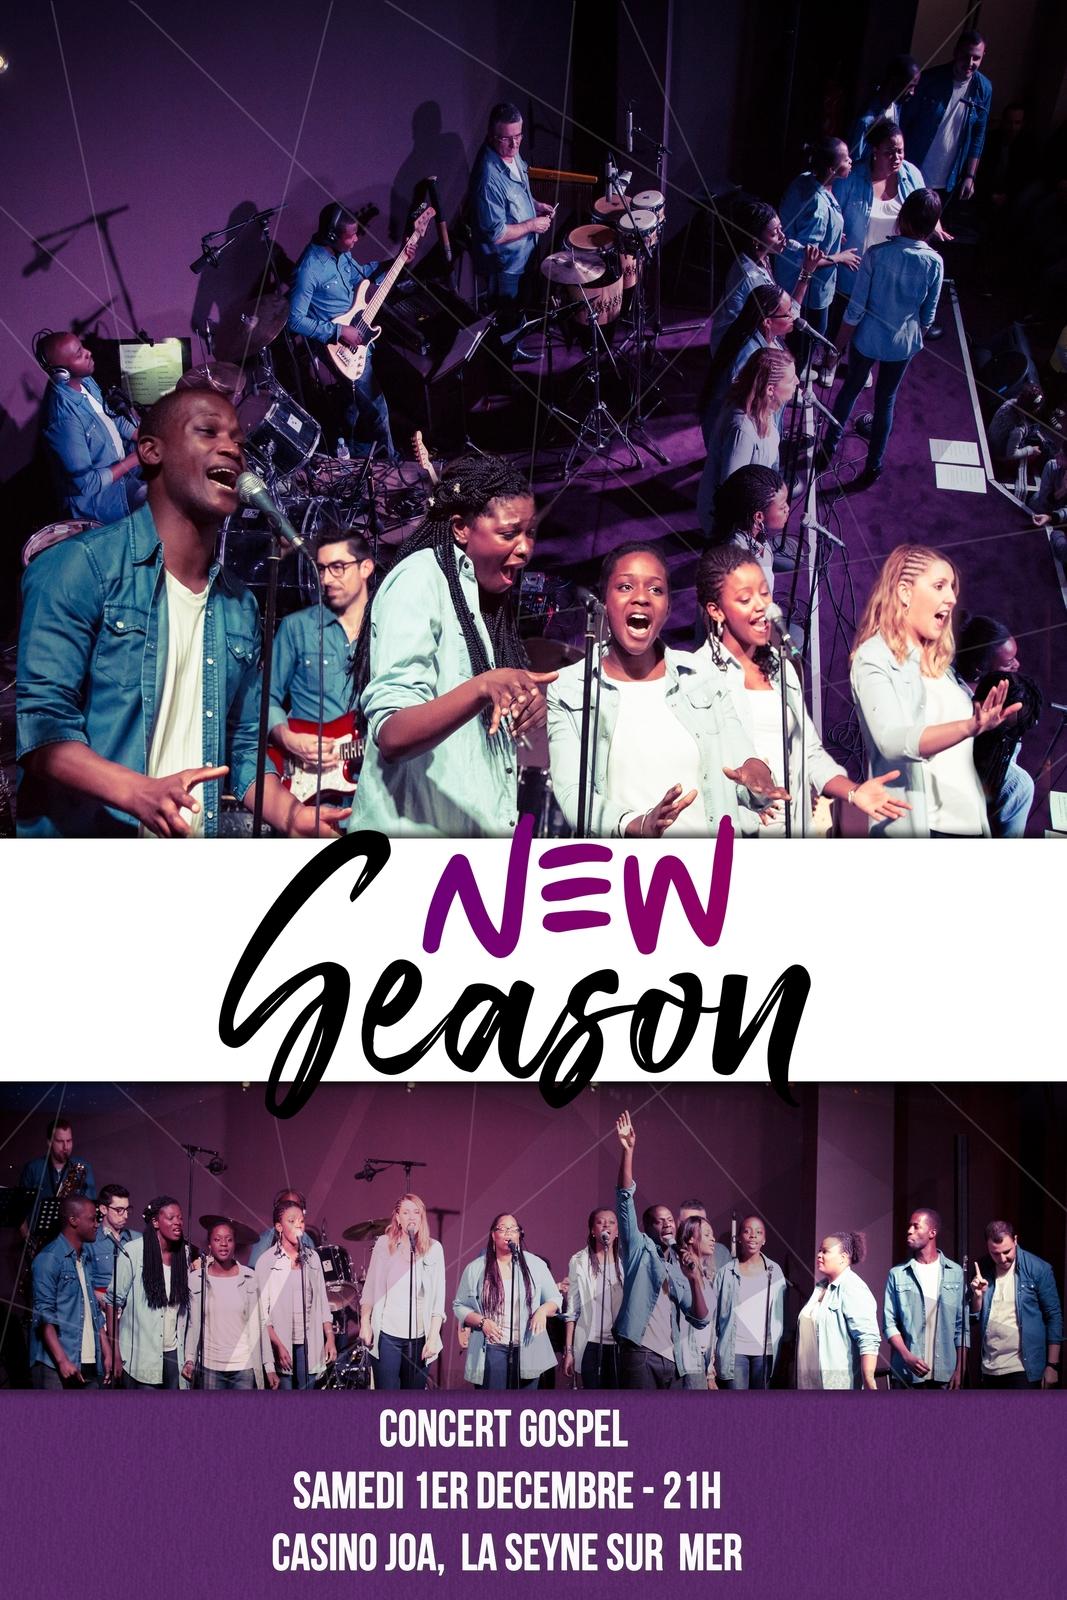 Concert gospel New Season JOA